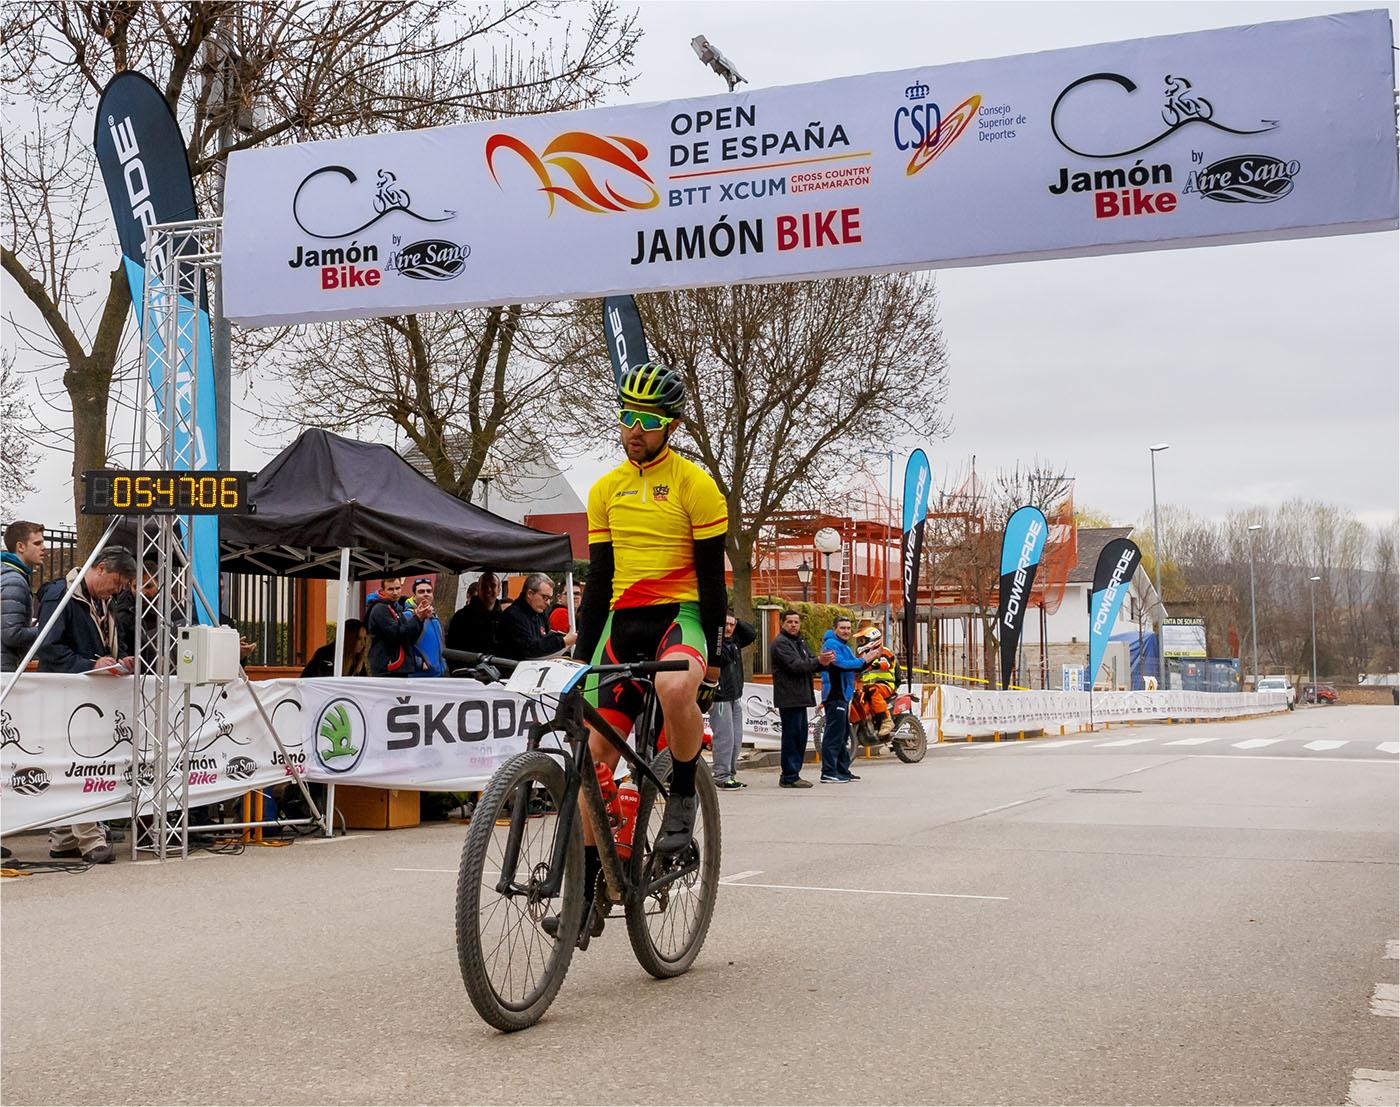 OpenEspXCUM_Jamon Bike_llegada Dani Carre